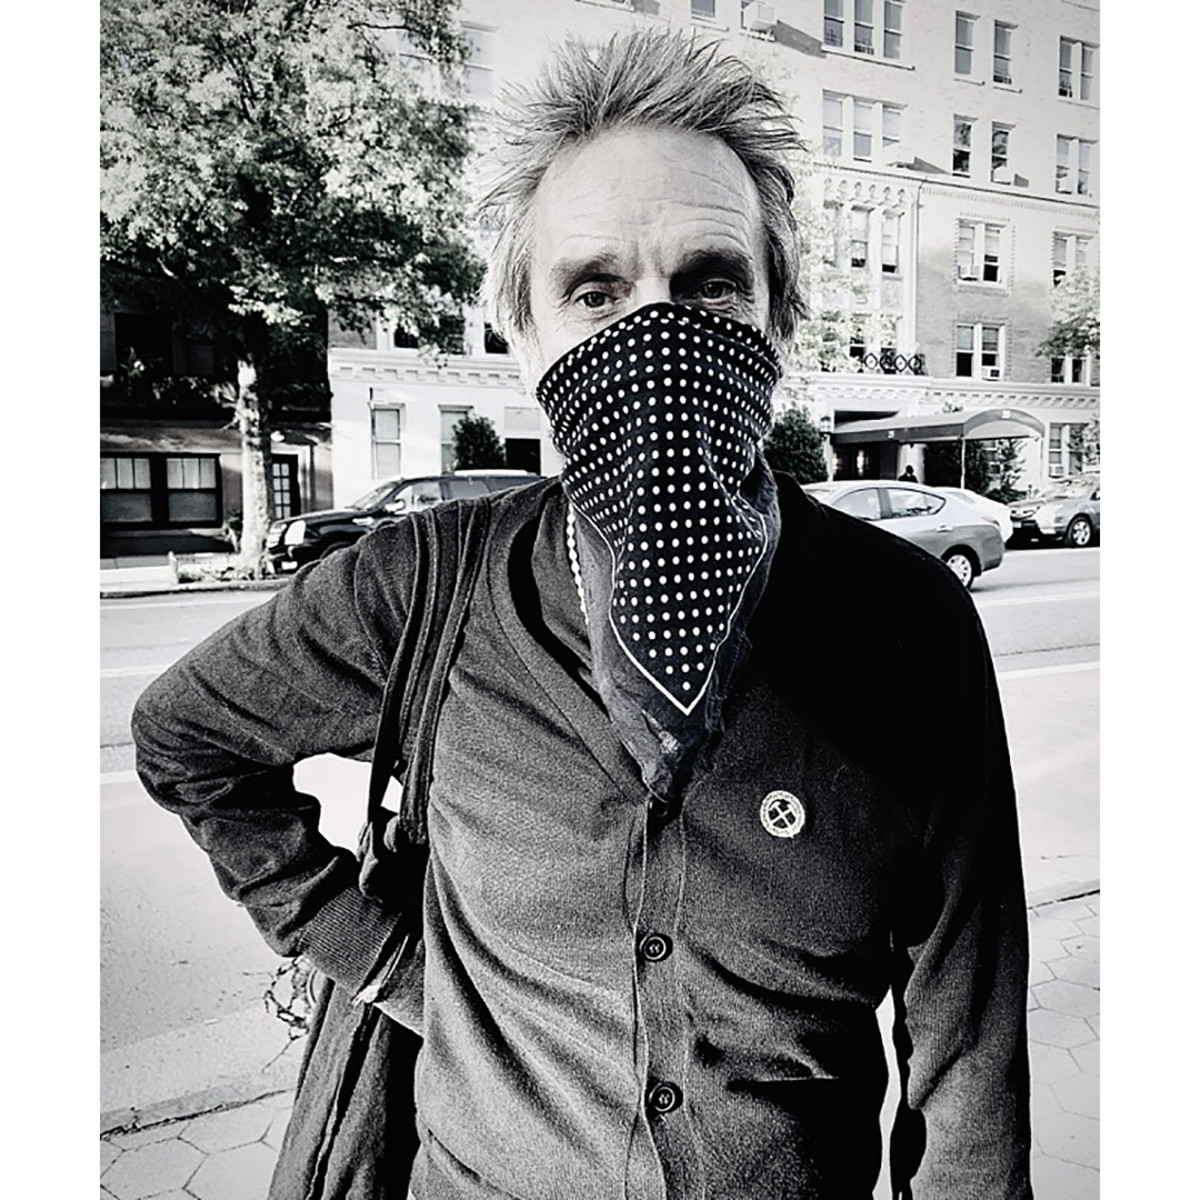 Producer, artist and longtime Clash associate Kosmo Vinyl. Photo taken by actor Matt Dillon.